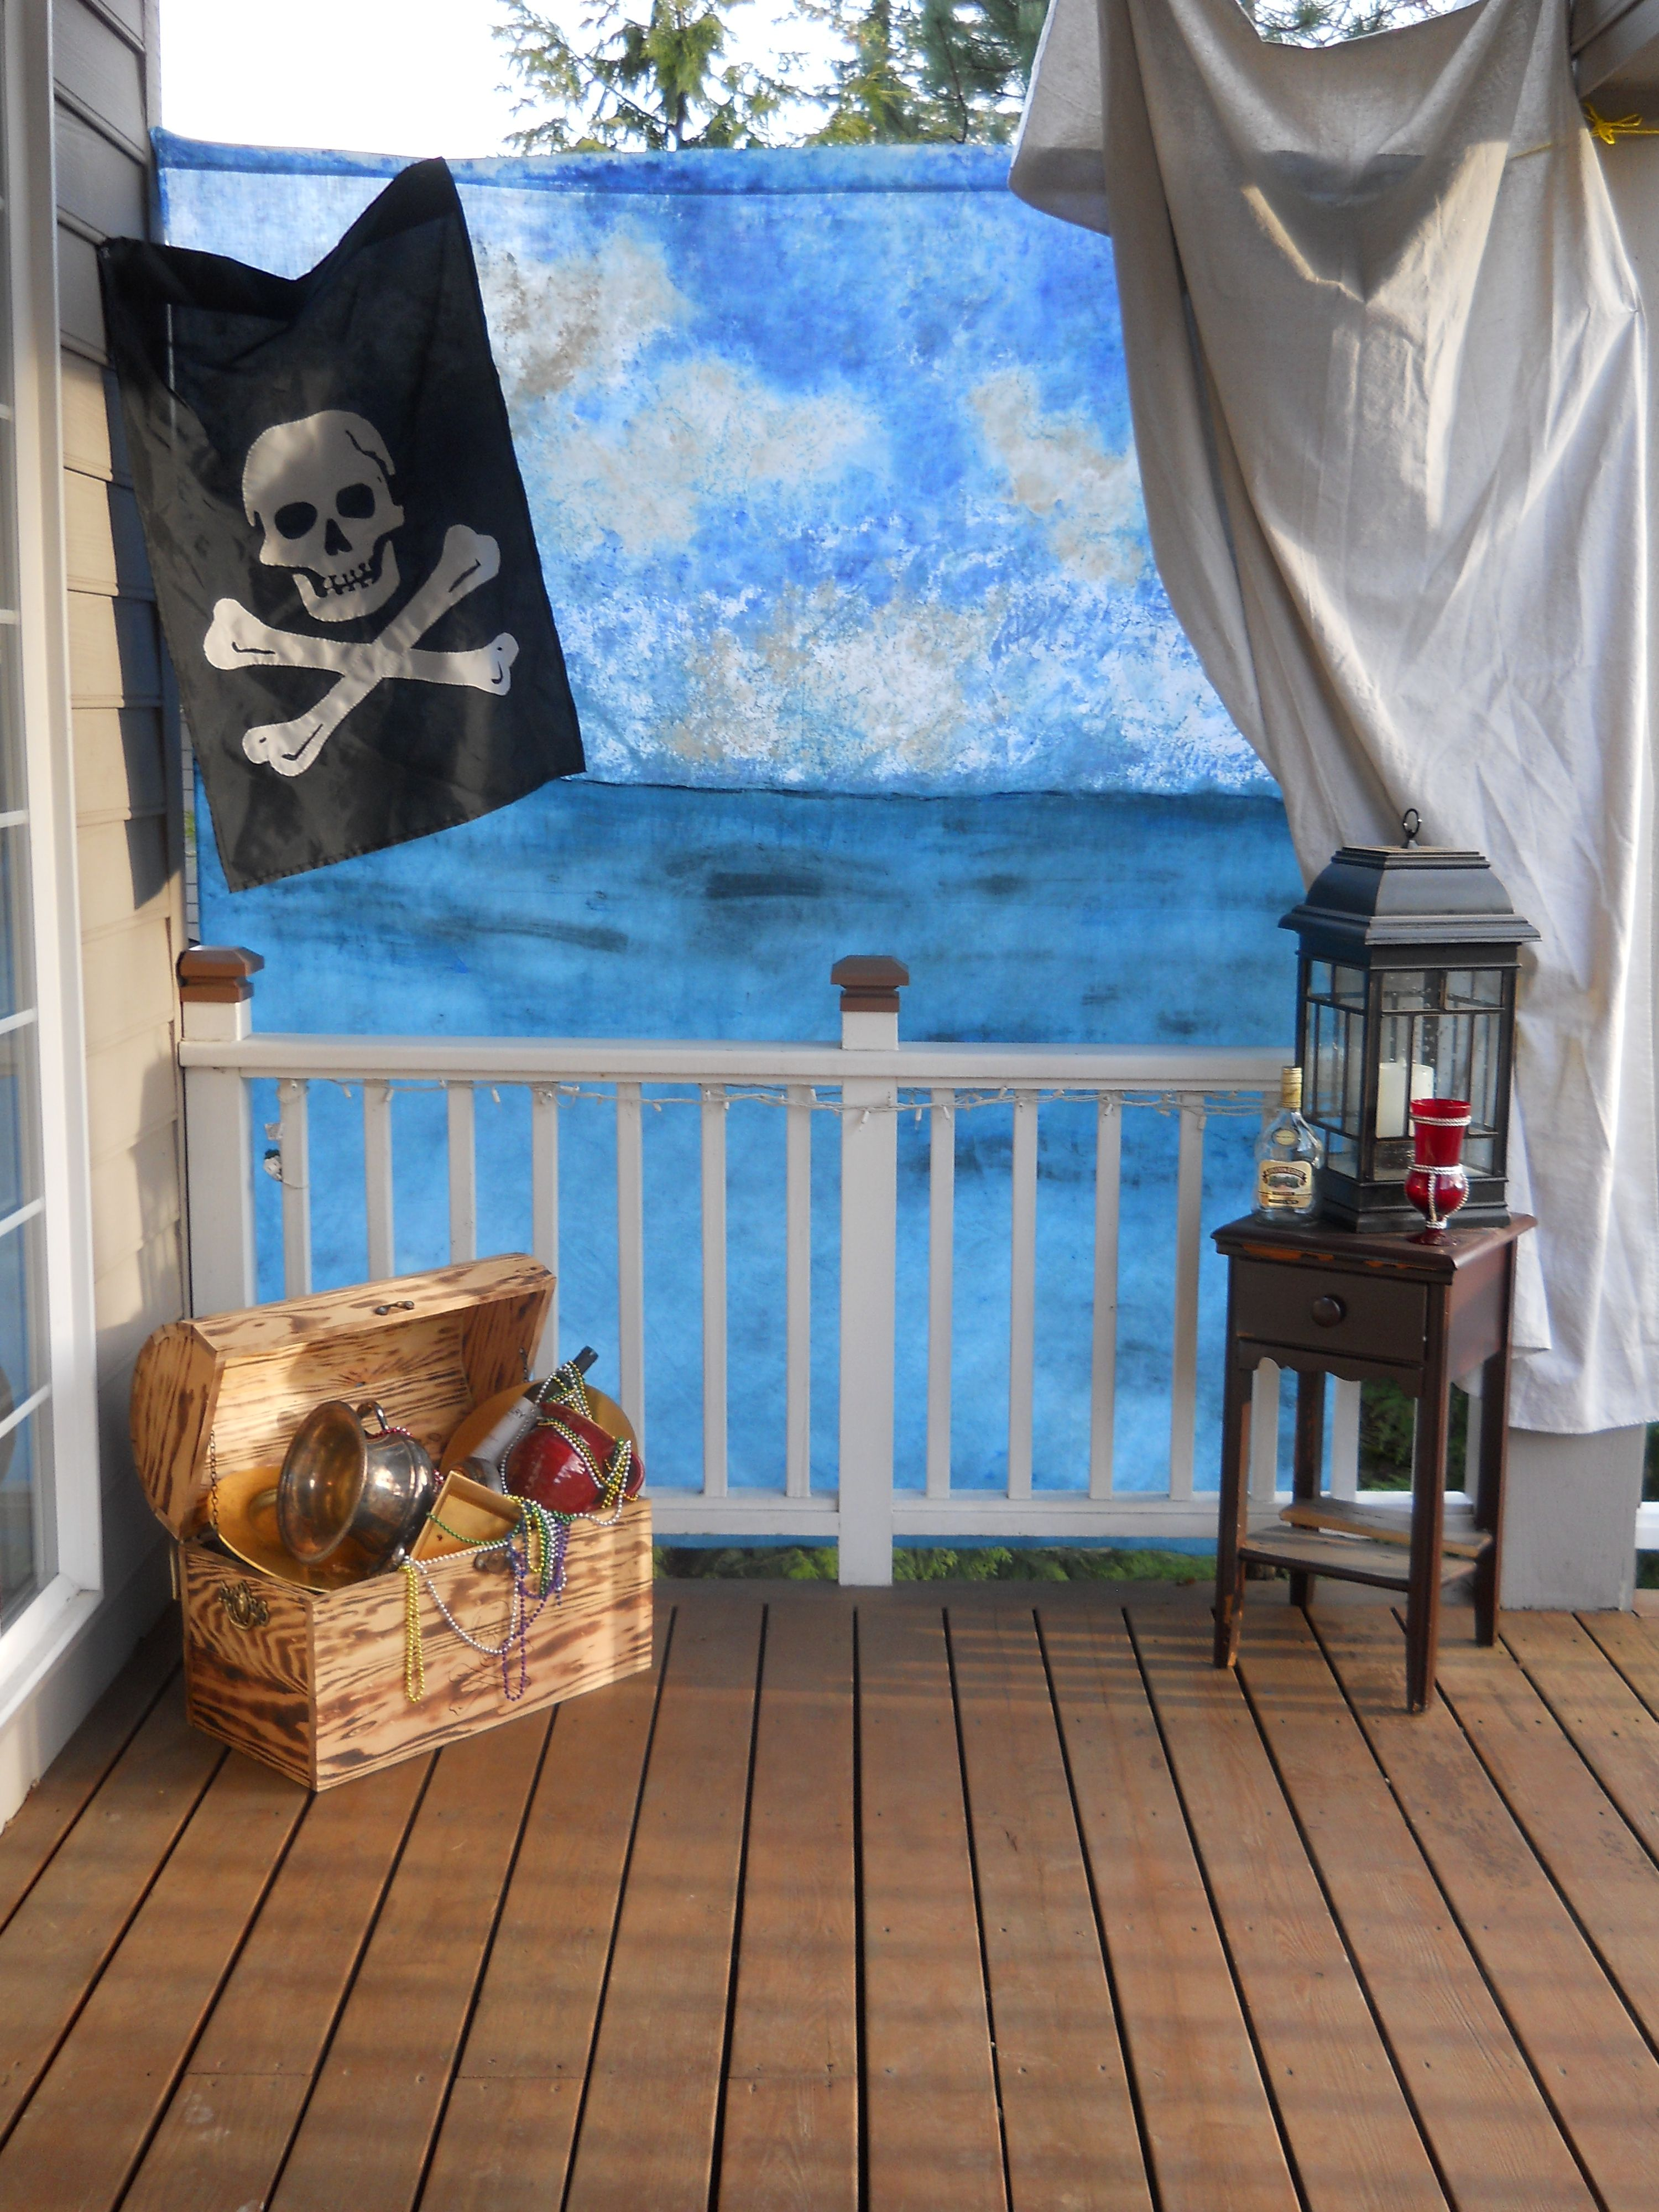 7x7FT Vinyl Photography Backdrop,Pirate,Shark Cove Tortuga Island Photoshoot Props Photo Background Studio Prop